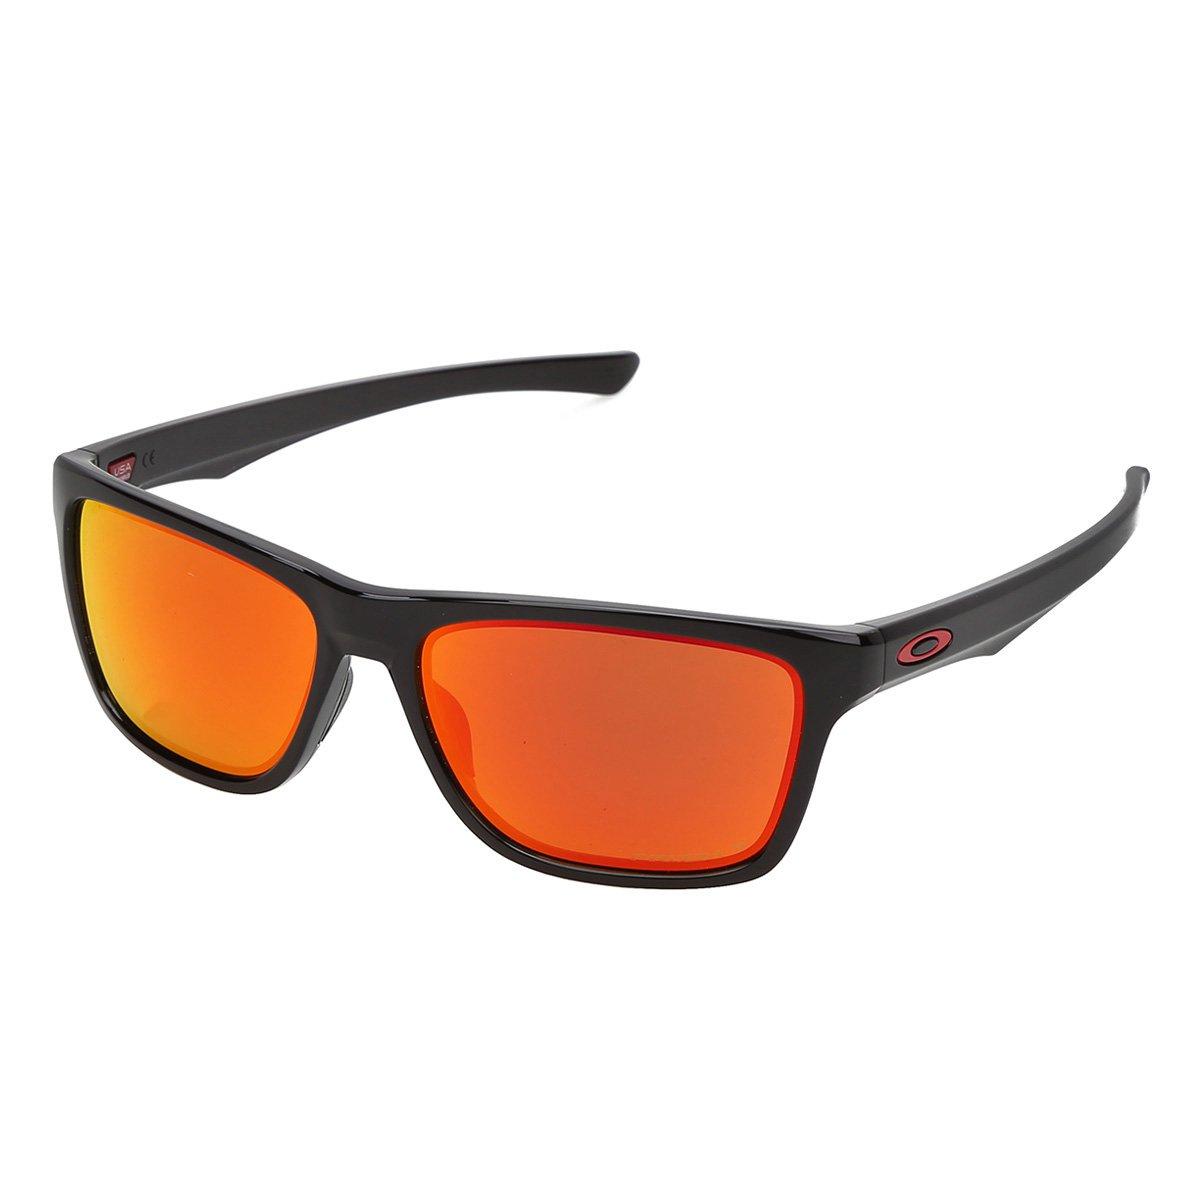 79efcef14307d Óculos Oakley Holston Polished Polarized 0OO9334-12 Masculino - Preto e  Laranja - Compre Agora